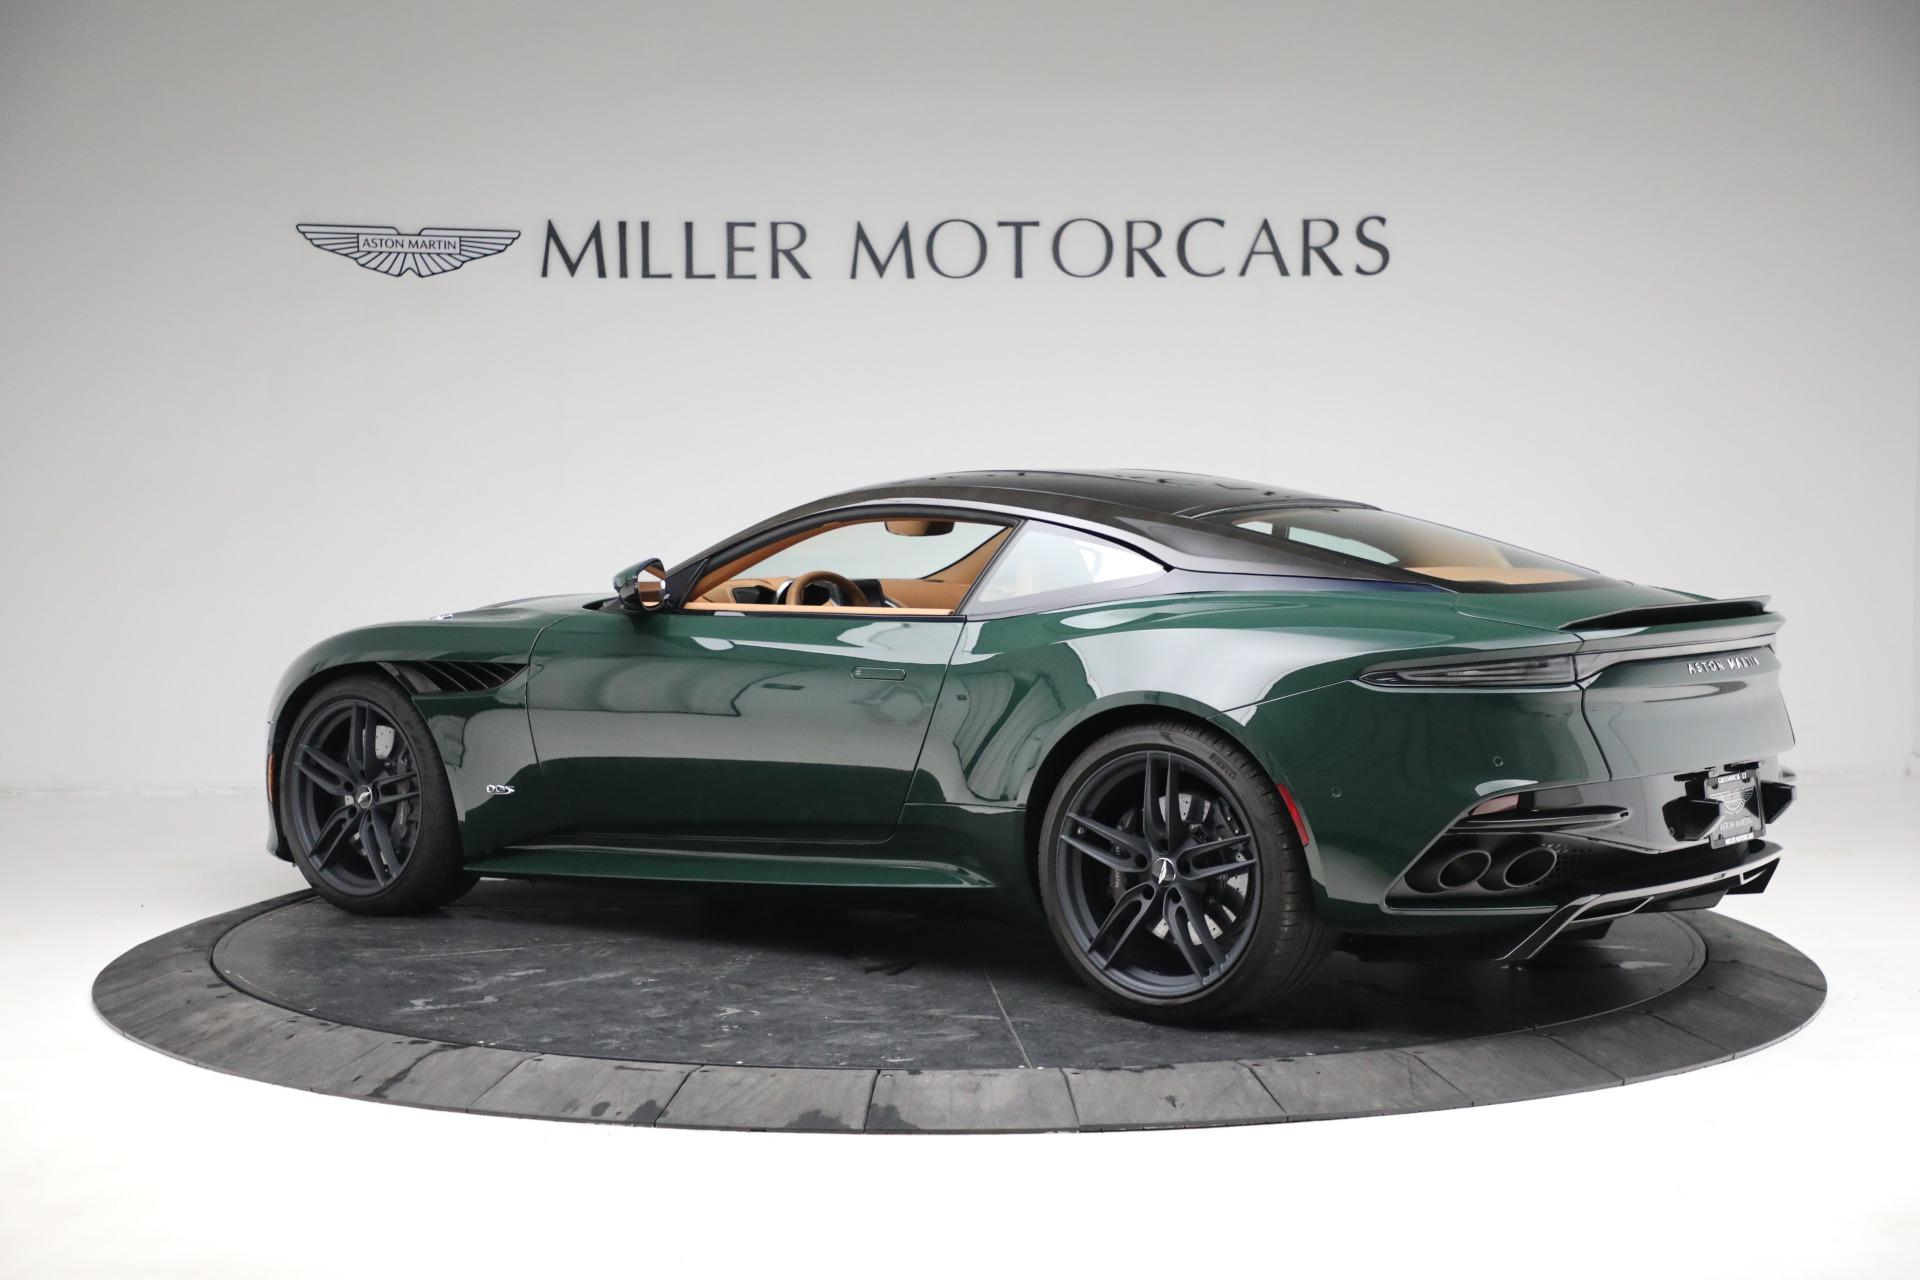 New 2020 Aston Martin DBS Superleggera Coupe For Sale 368486 In Greenwich, CT